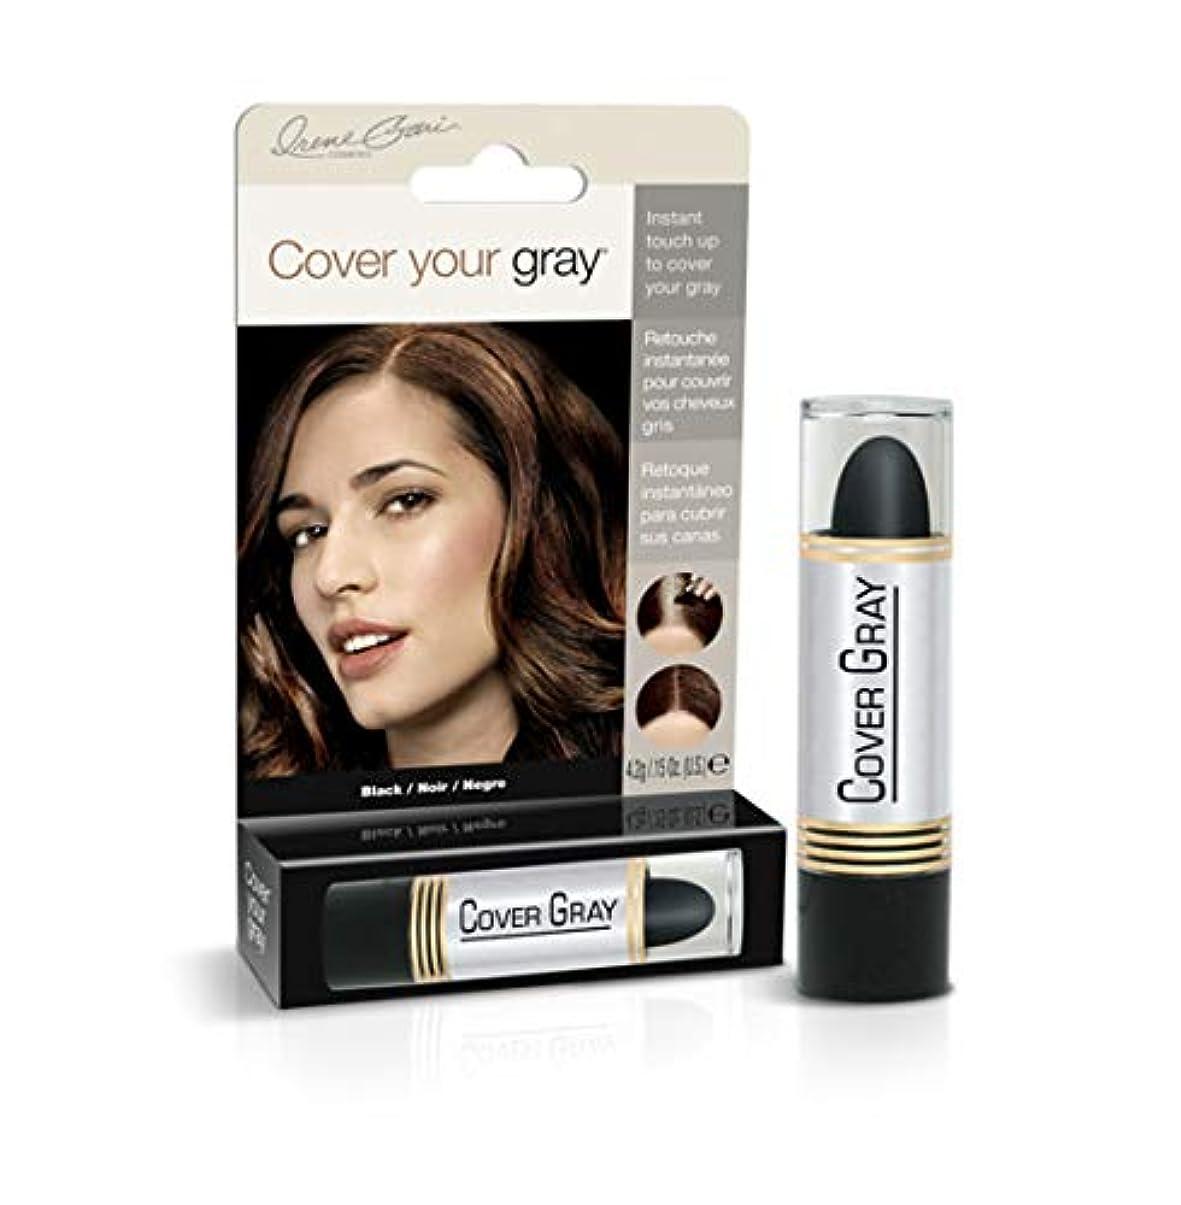 軍団四分円条約Cover Your Gray Stick Black 44 ml. (Pack of 6) (並行輸入品)